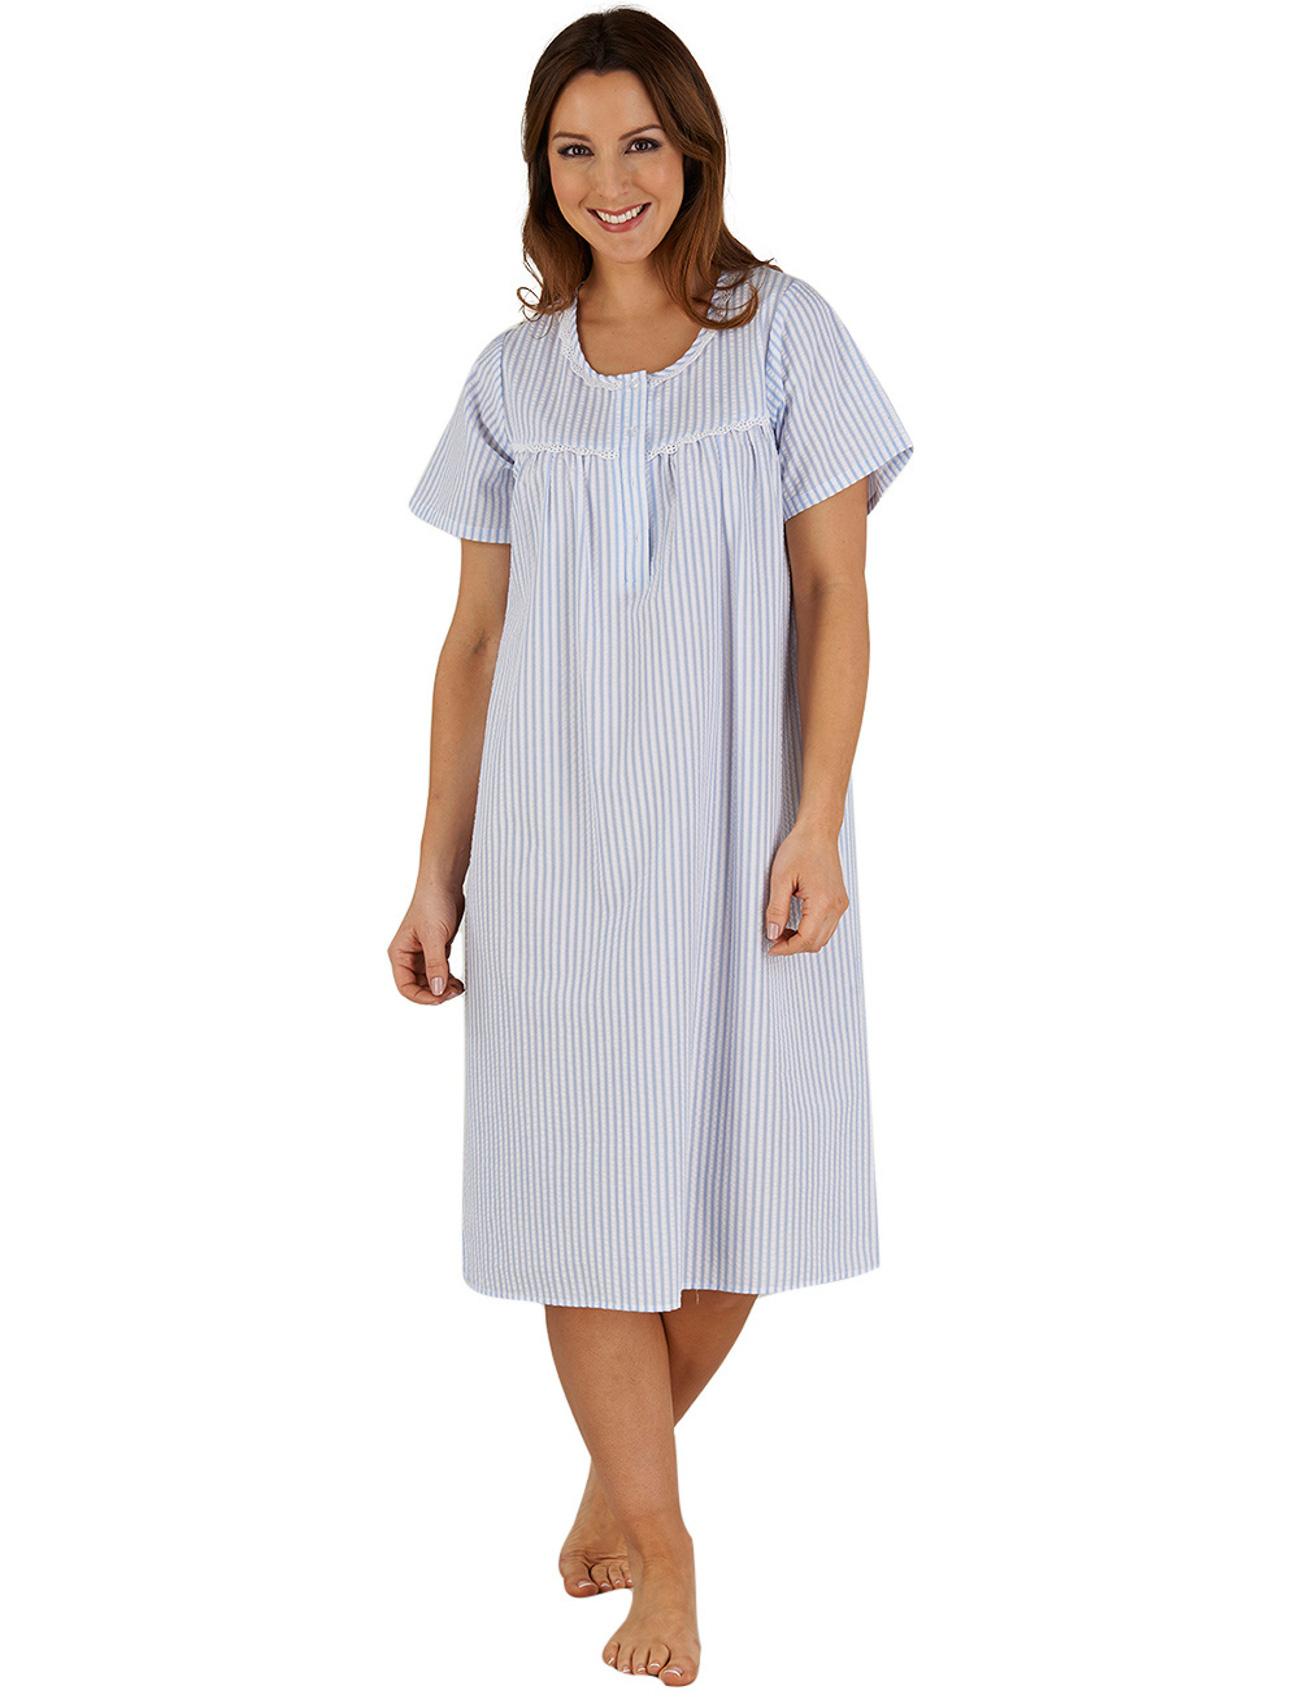 eca5699f97 Womens Night Dress Seersucker Stripe Short Sleeve Slenderella Lace Trim  Nighty